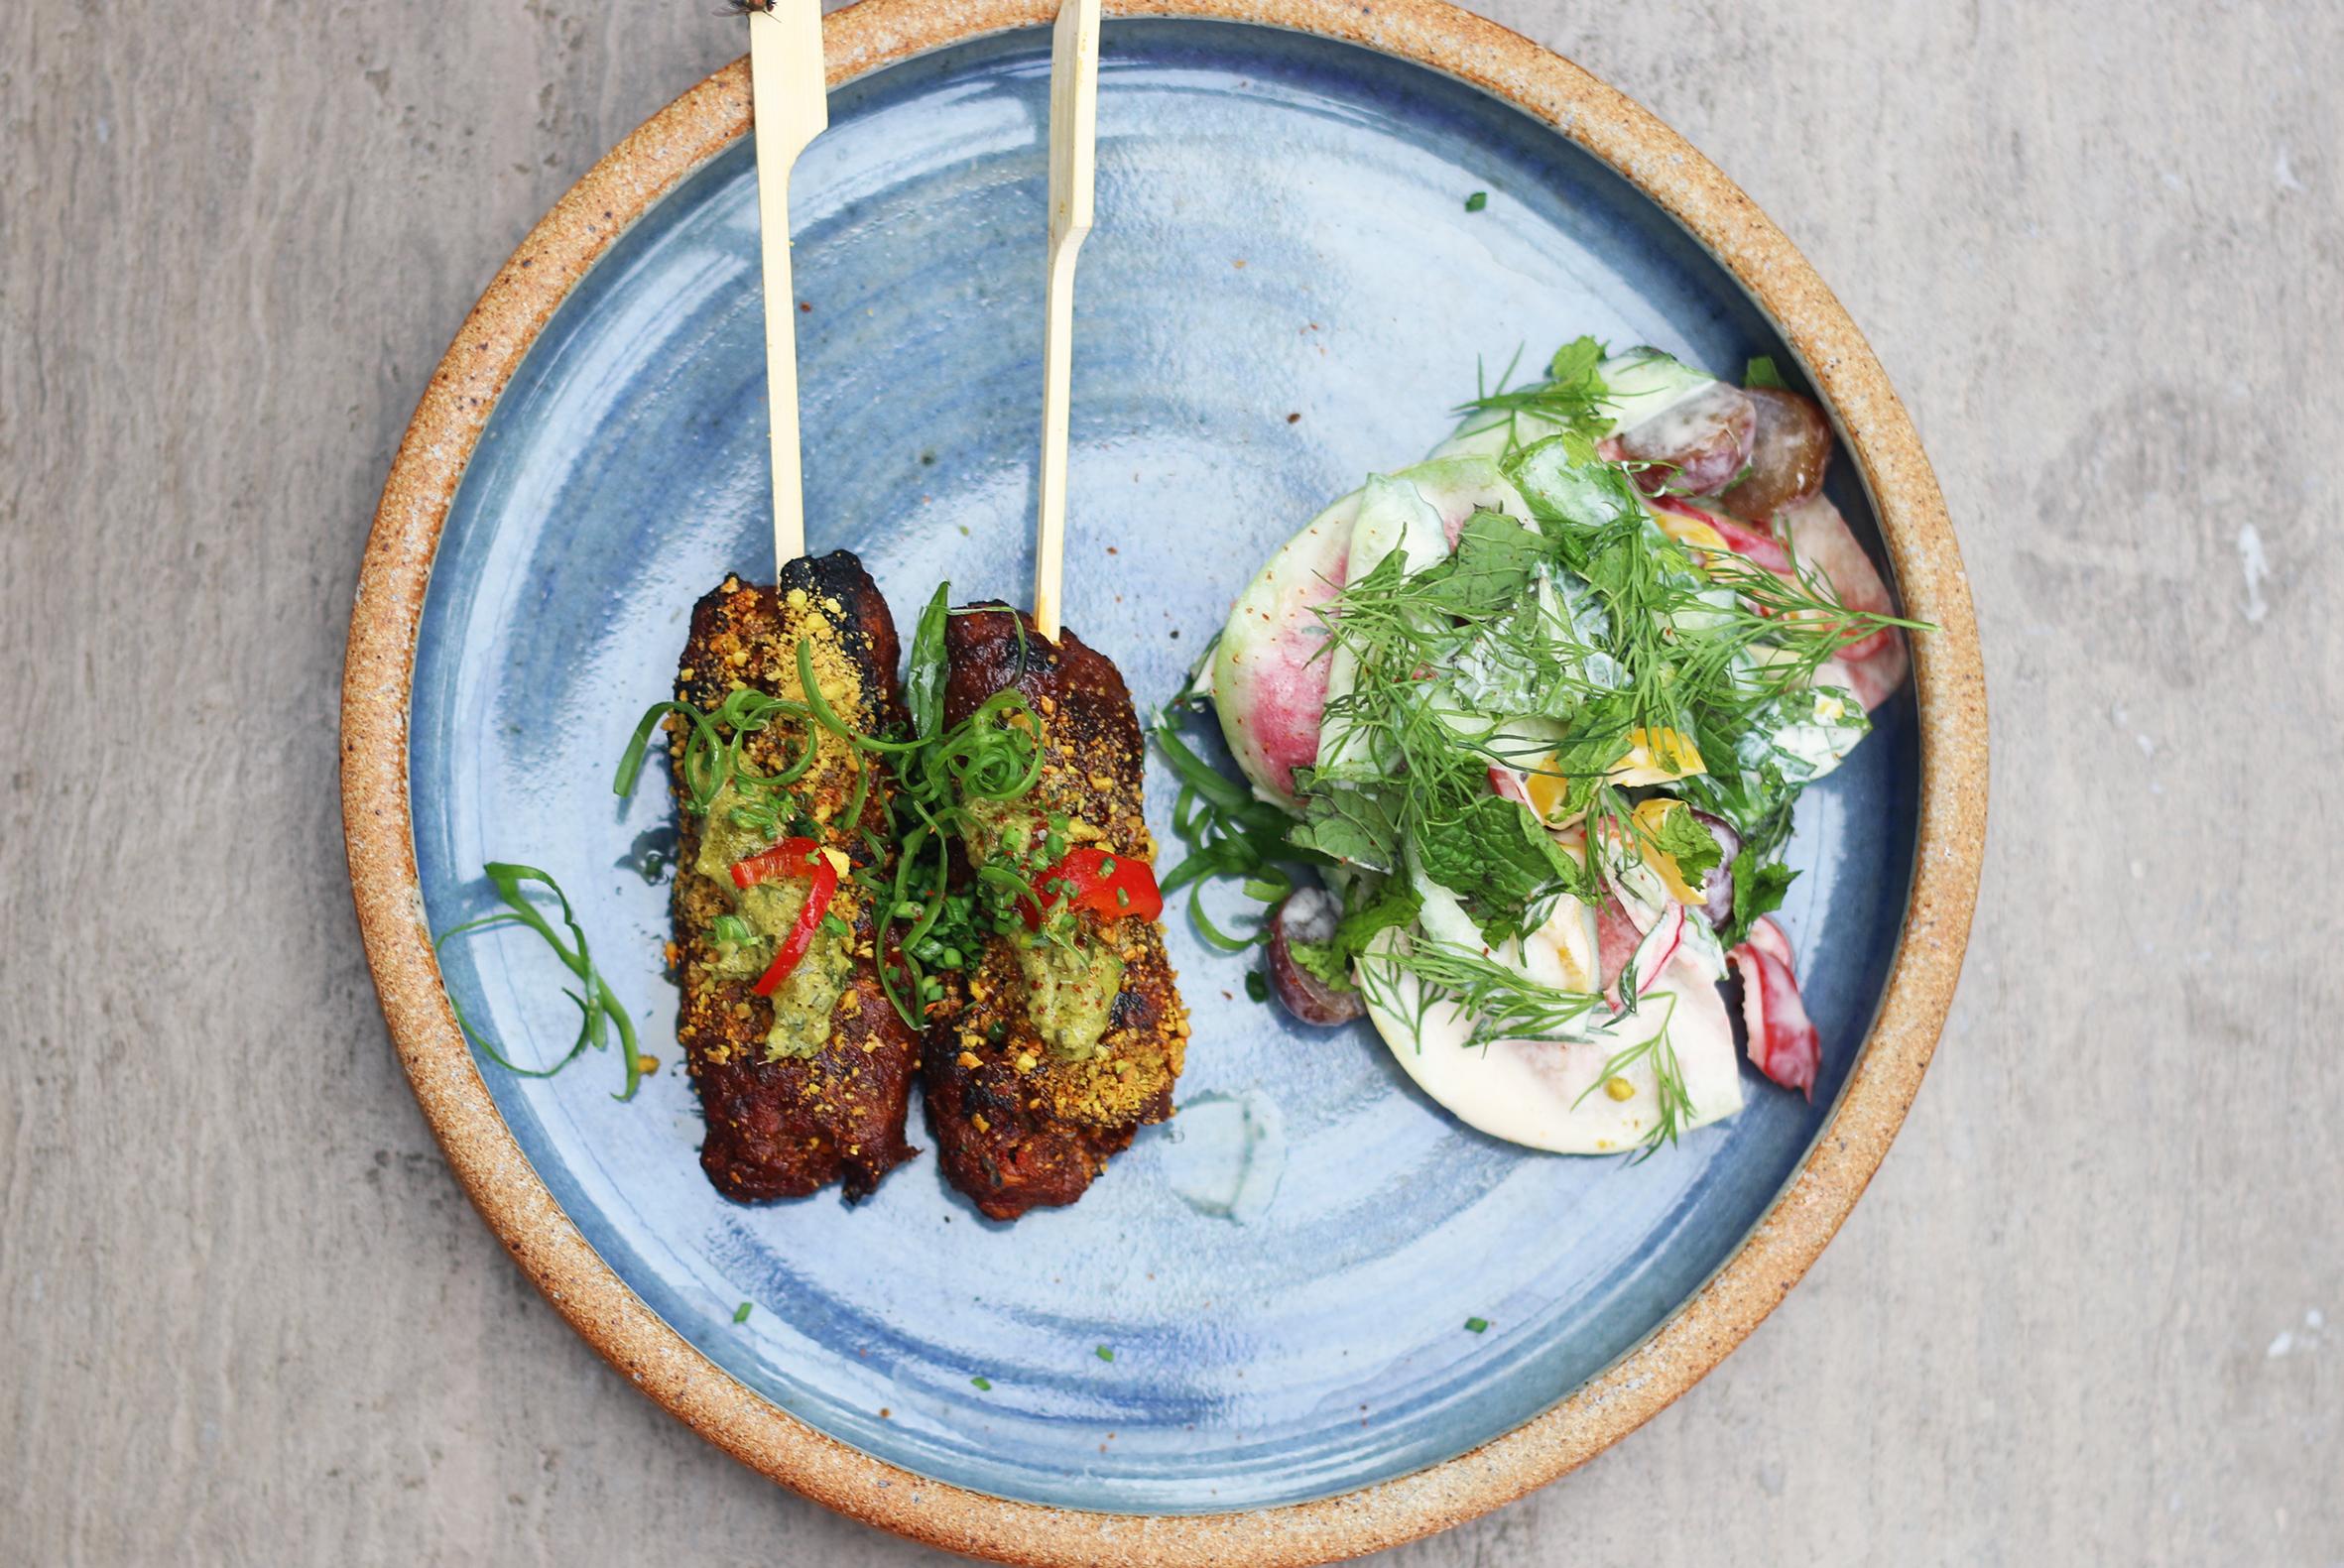 LAMB & BEEF SKEWERS:pistachio, cardamom, chili, pickled grape, curry lebni